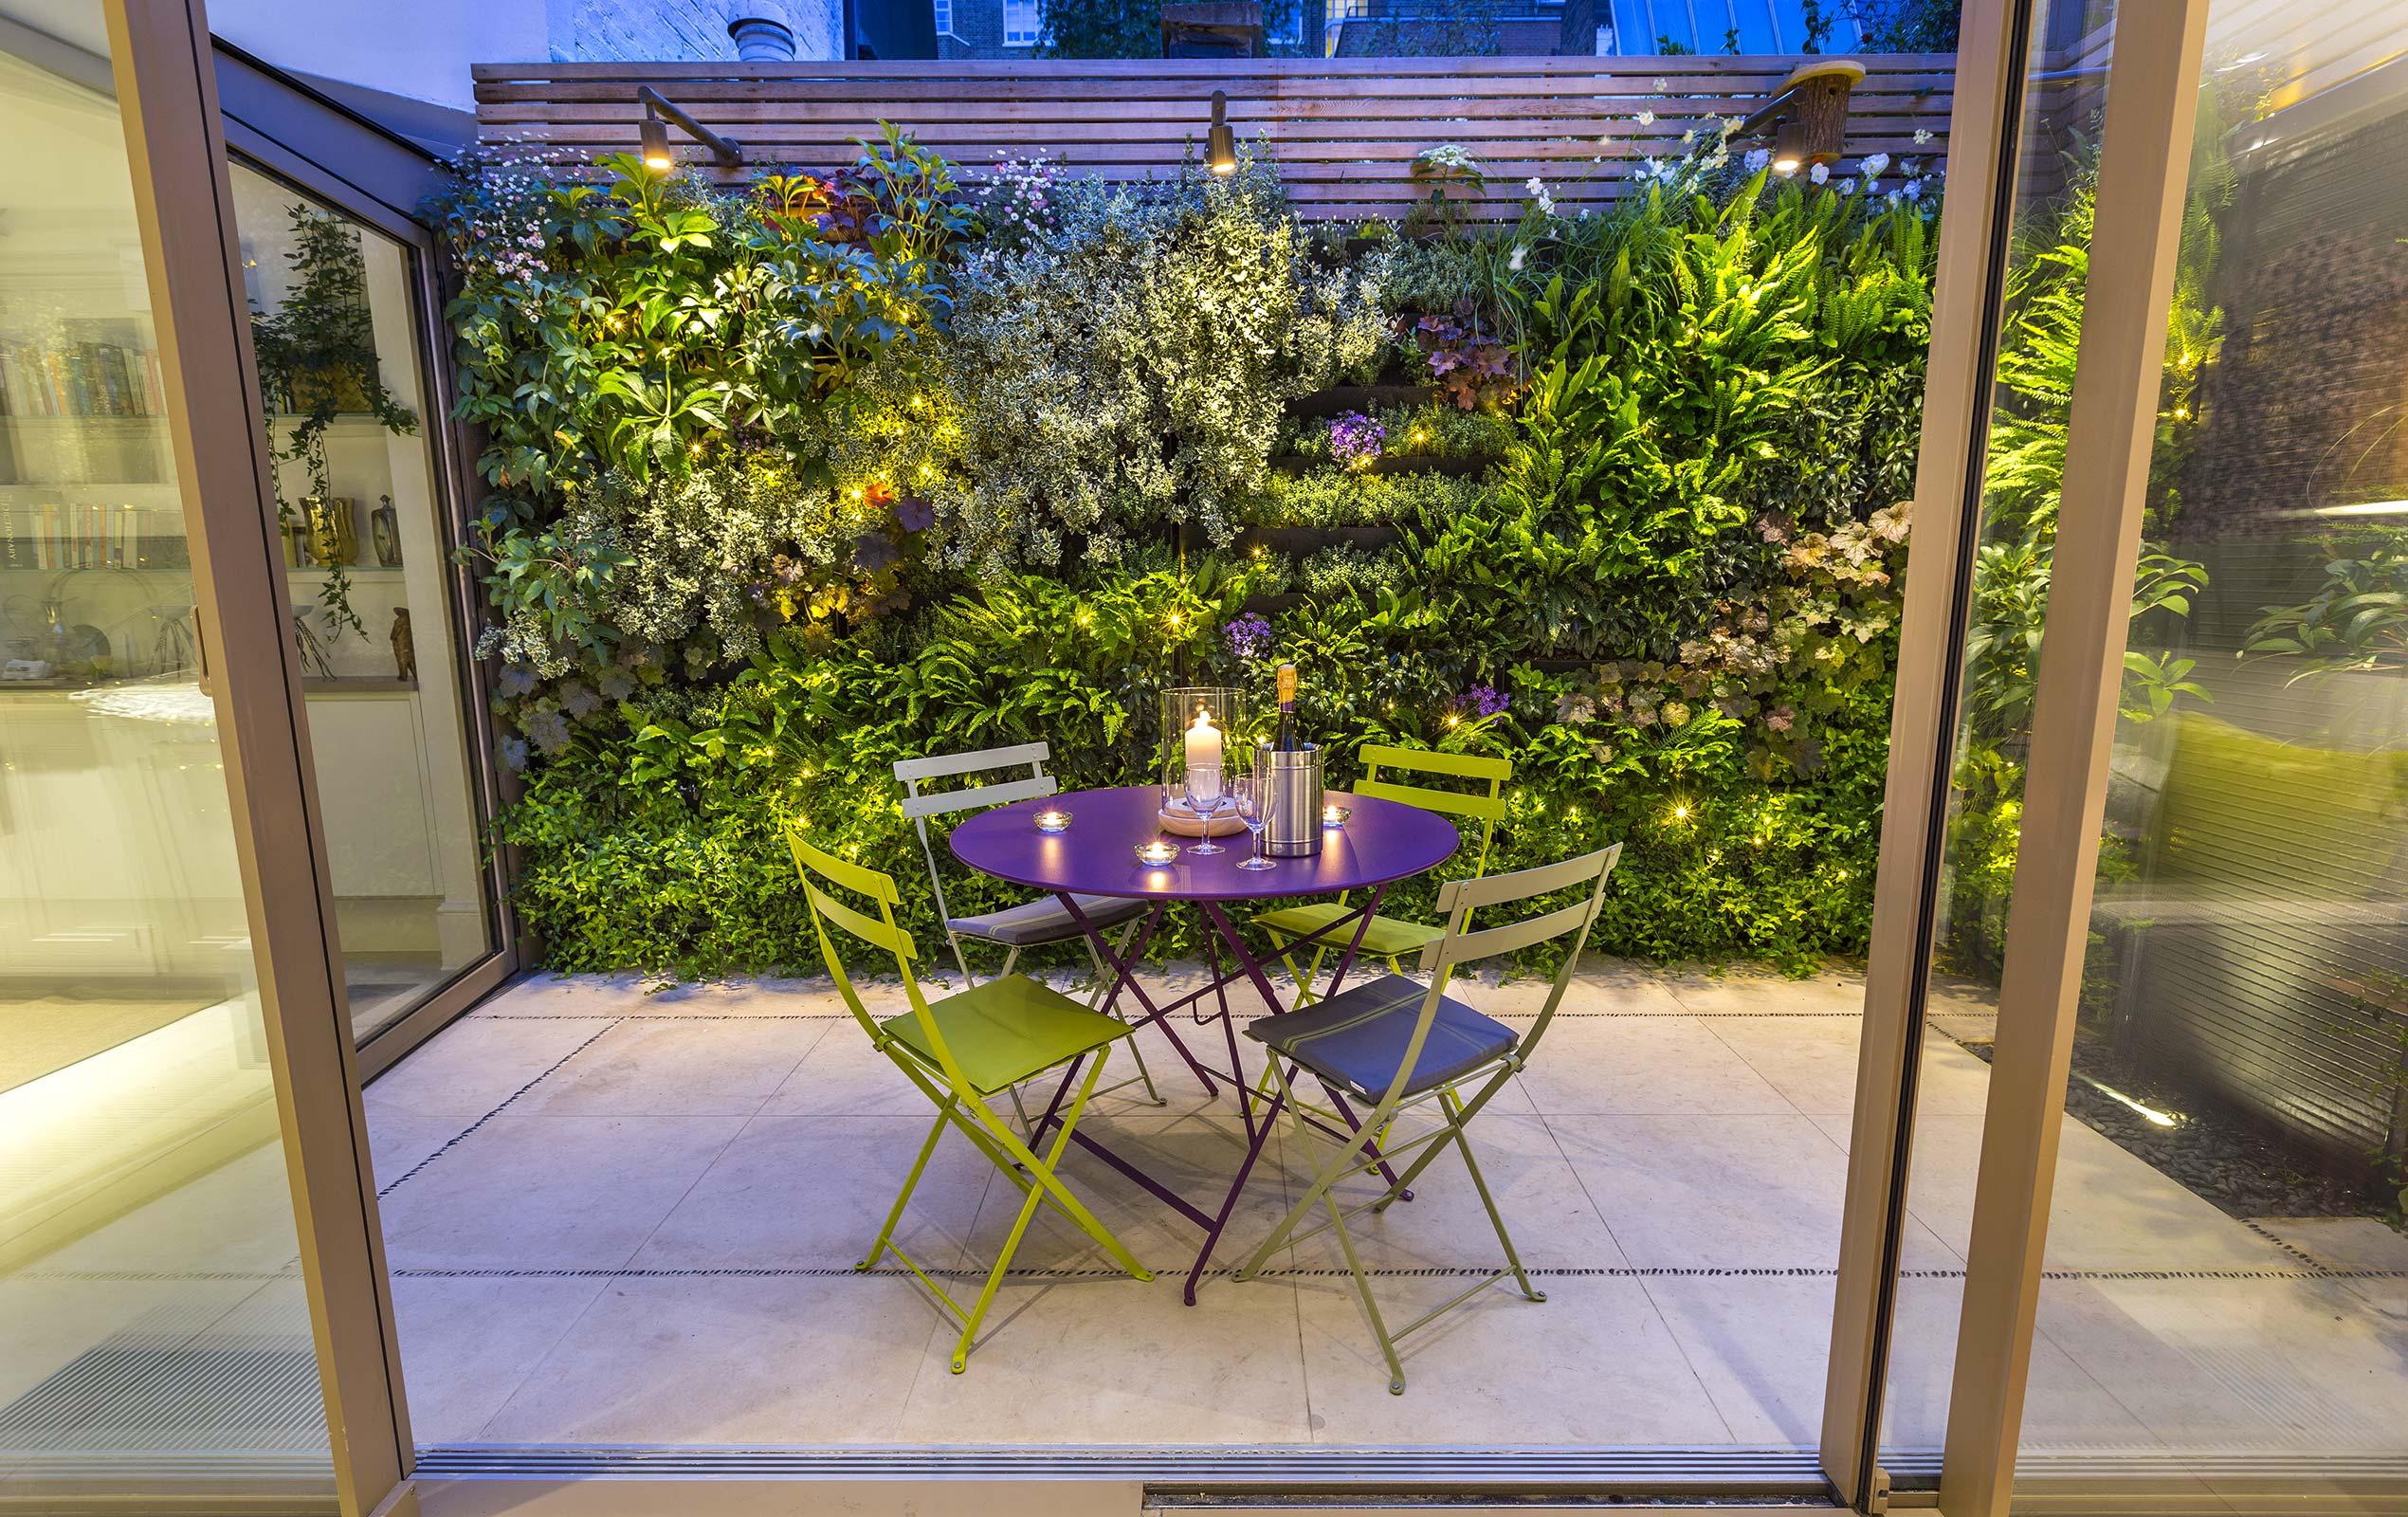 Kensal Place Garden Design by Maïtanne Hunt